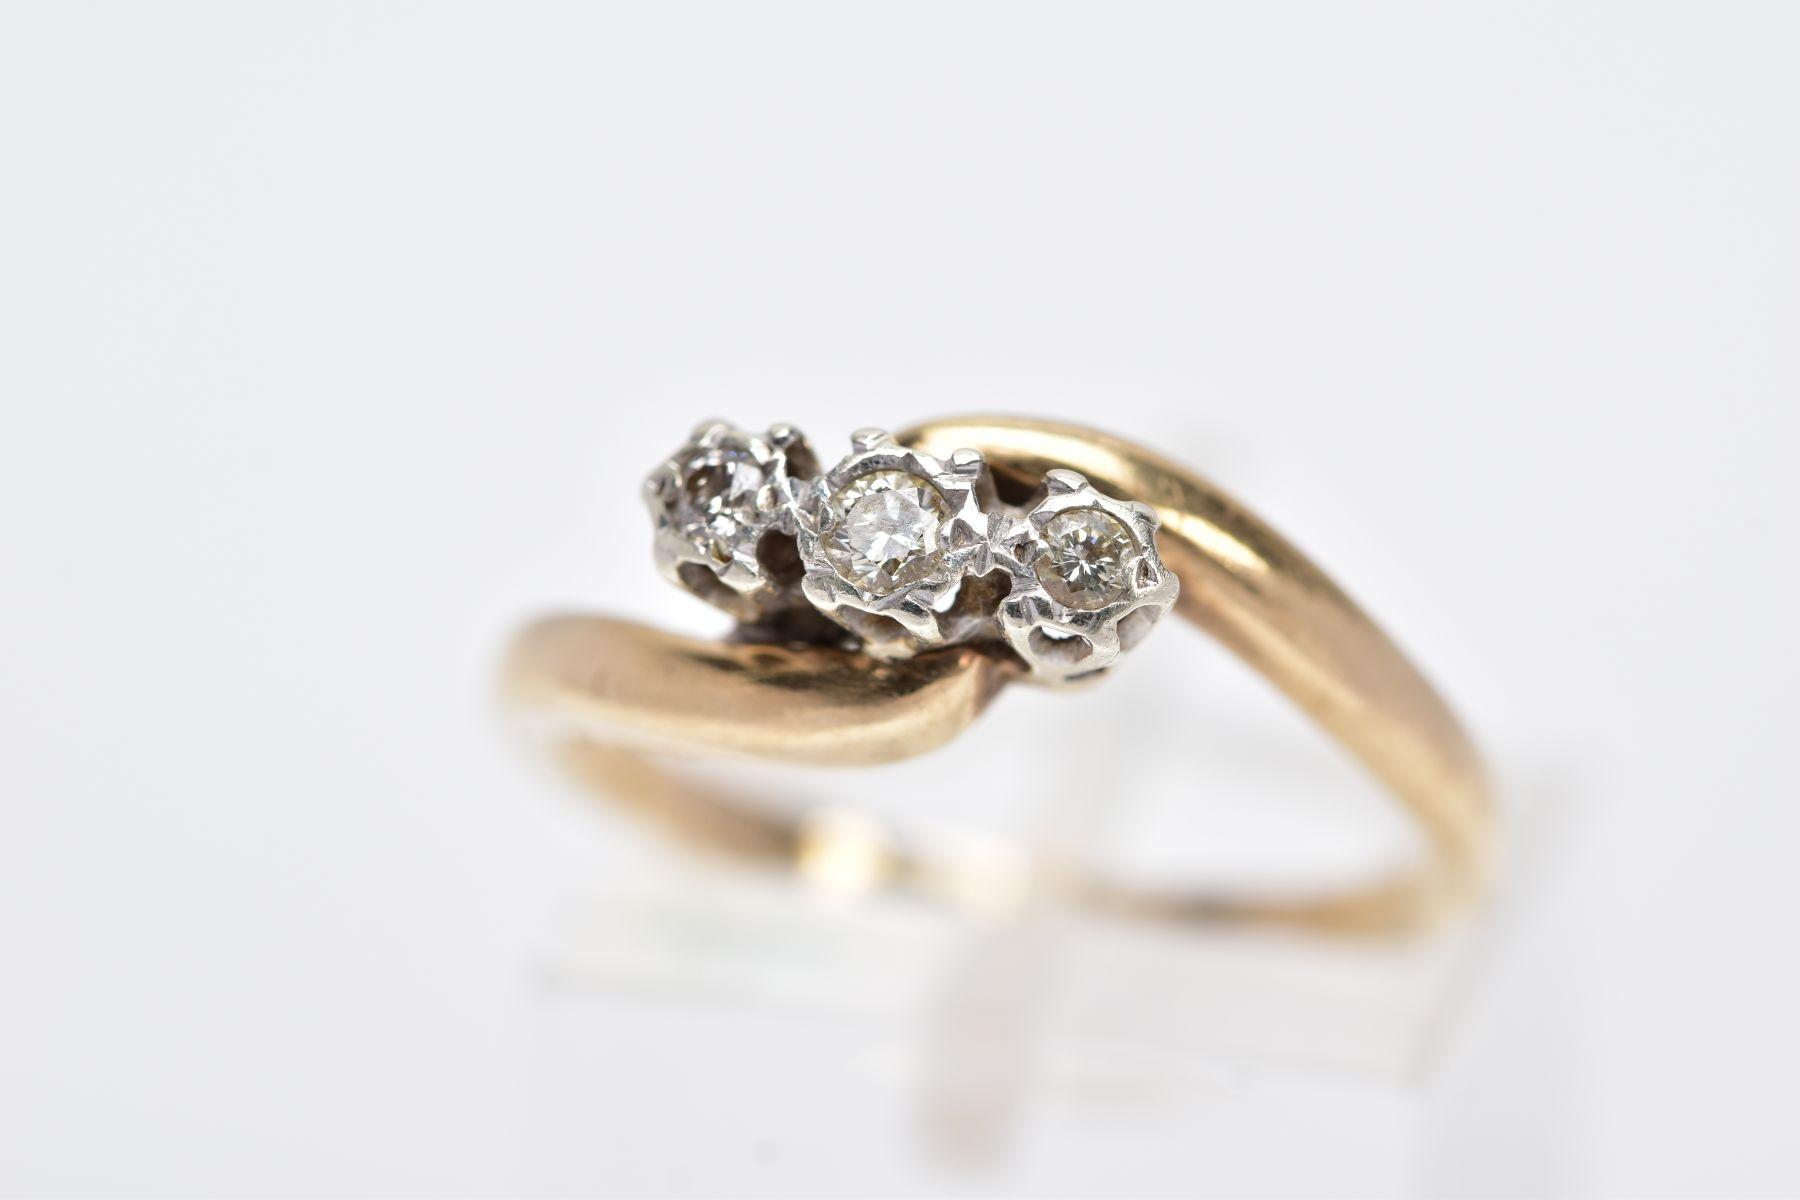 A 9CT GOLD THREE STONE DIAMOND RING, designed with three graduated round brilliant cut diamonds,